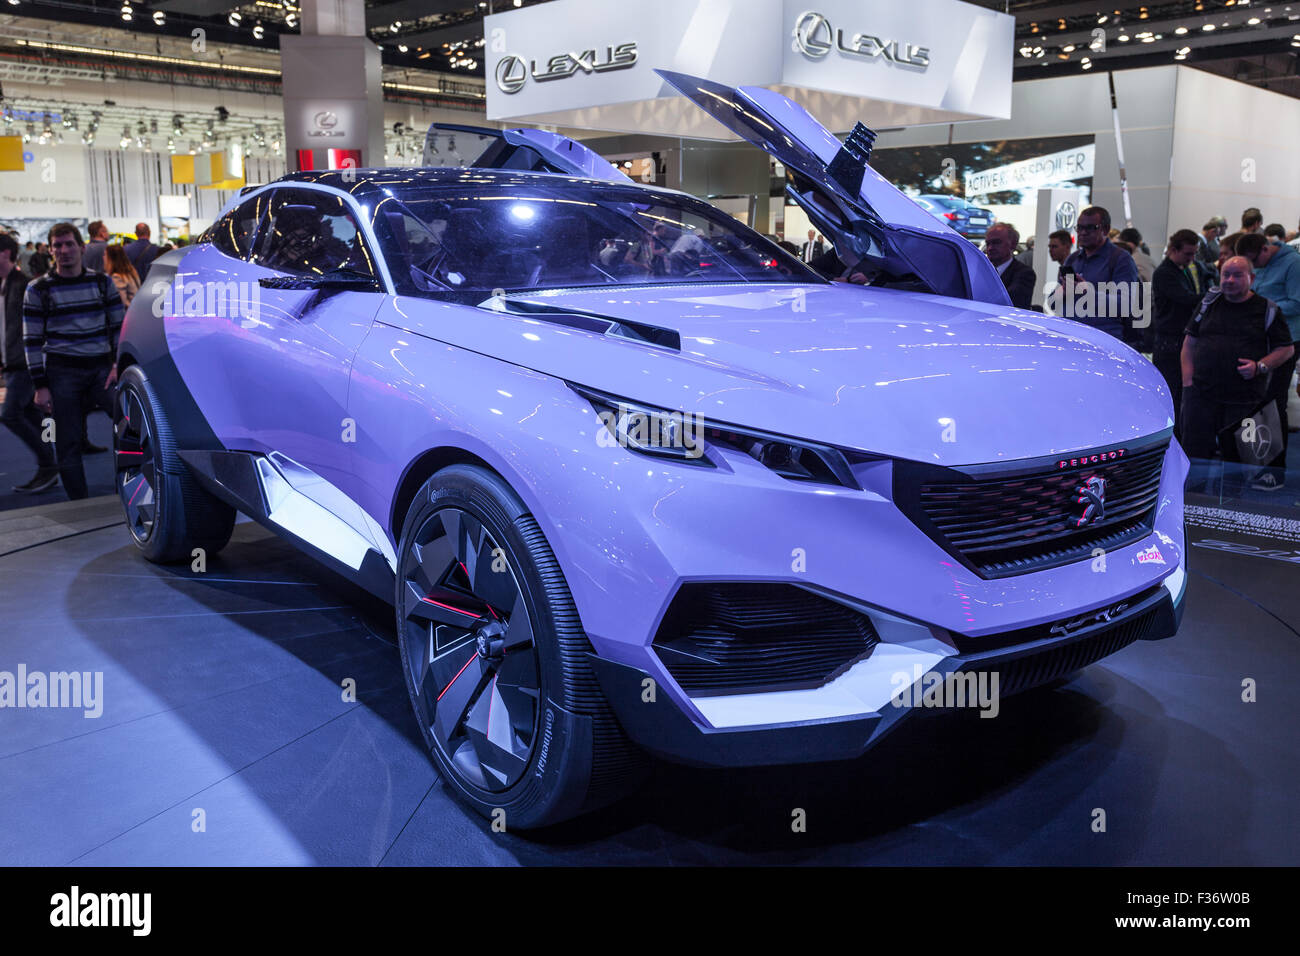 Peugeot QUARTZ Concept Car at the IAA International Motor Show 2015 - Stock Image